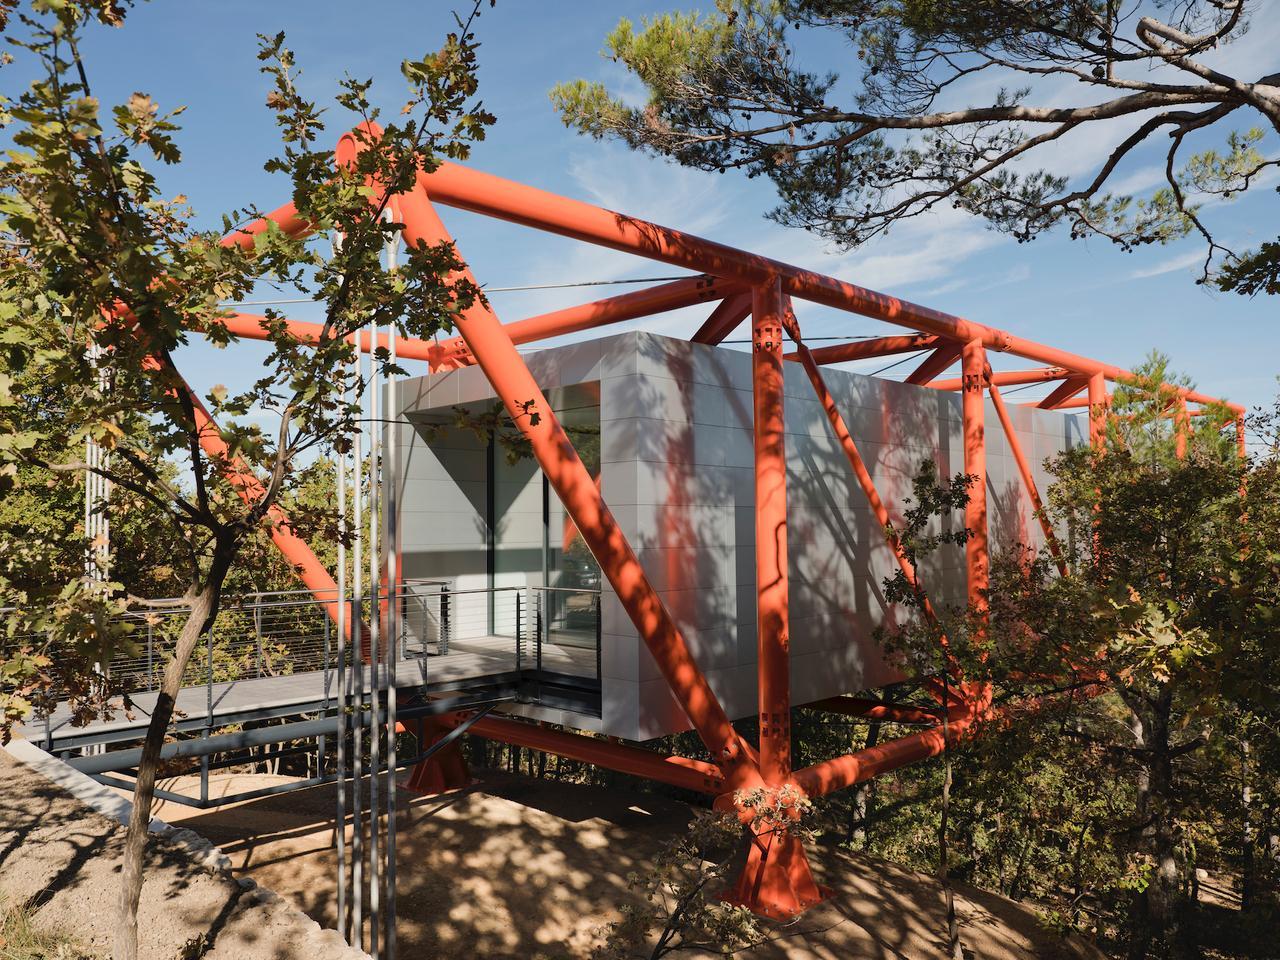 Richard Rogers의 드로잉 갤러리는 2011 년에 처음 구상되어 2020 년 말에 완성되었습니다.